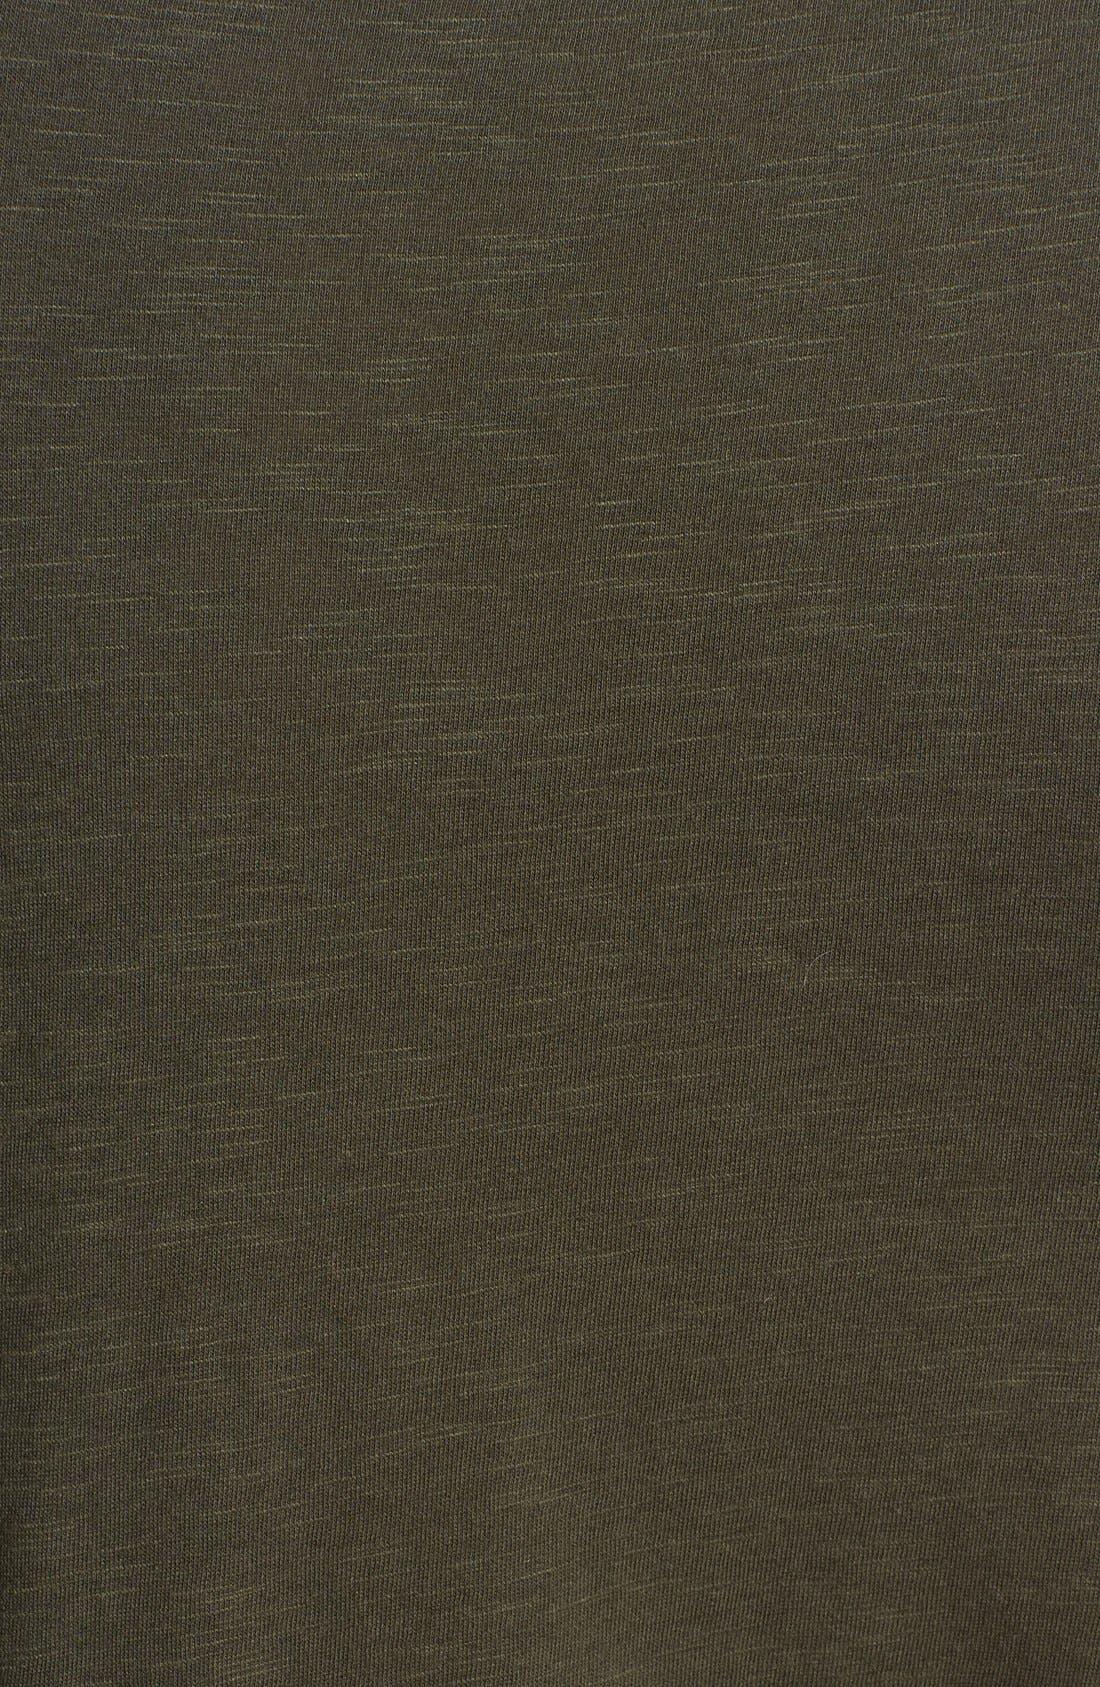 Beaded Knit Tank,                             Alternate thumbnail 3, color,                             340